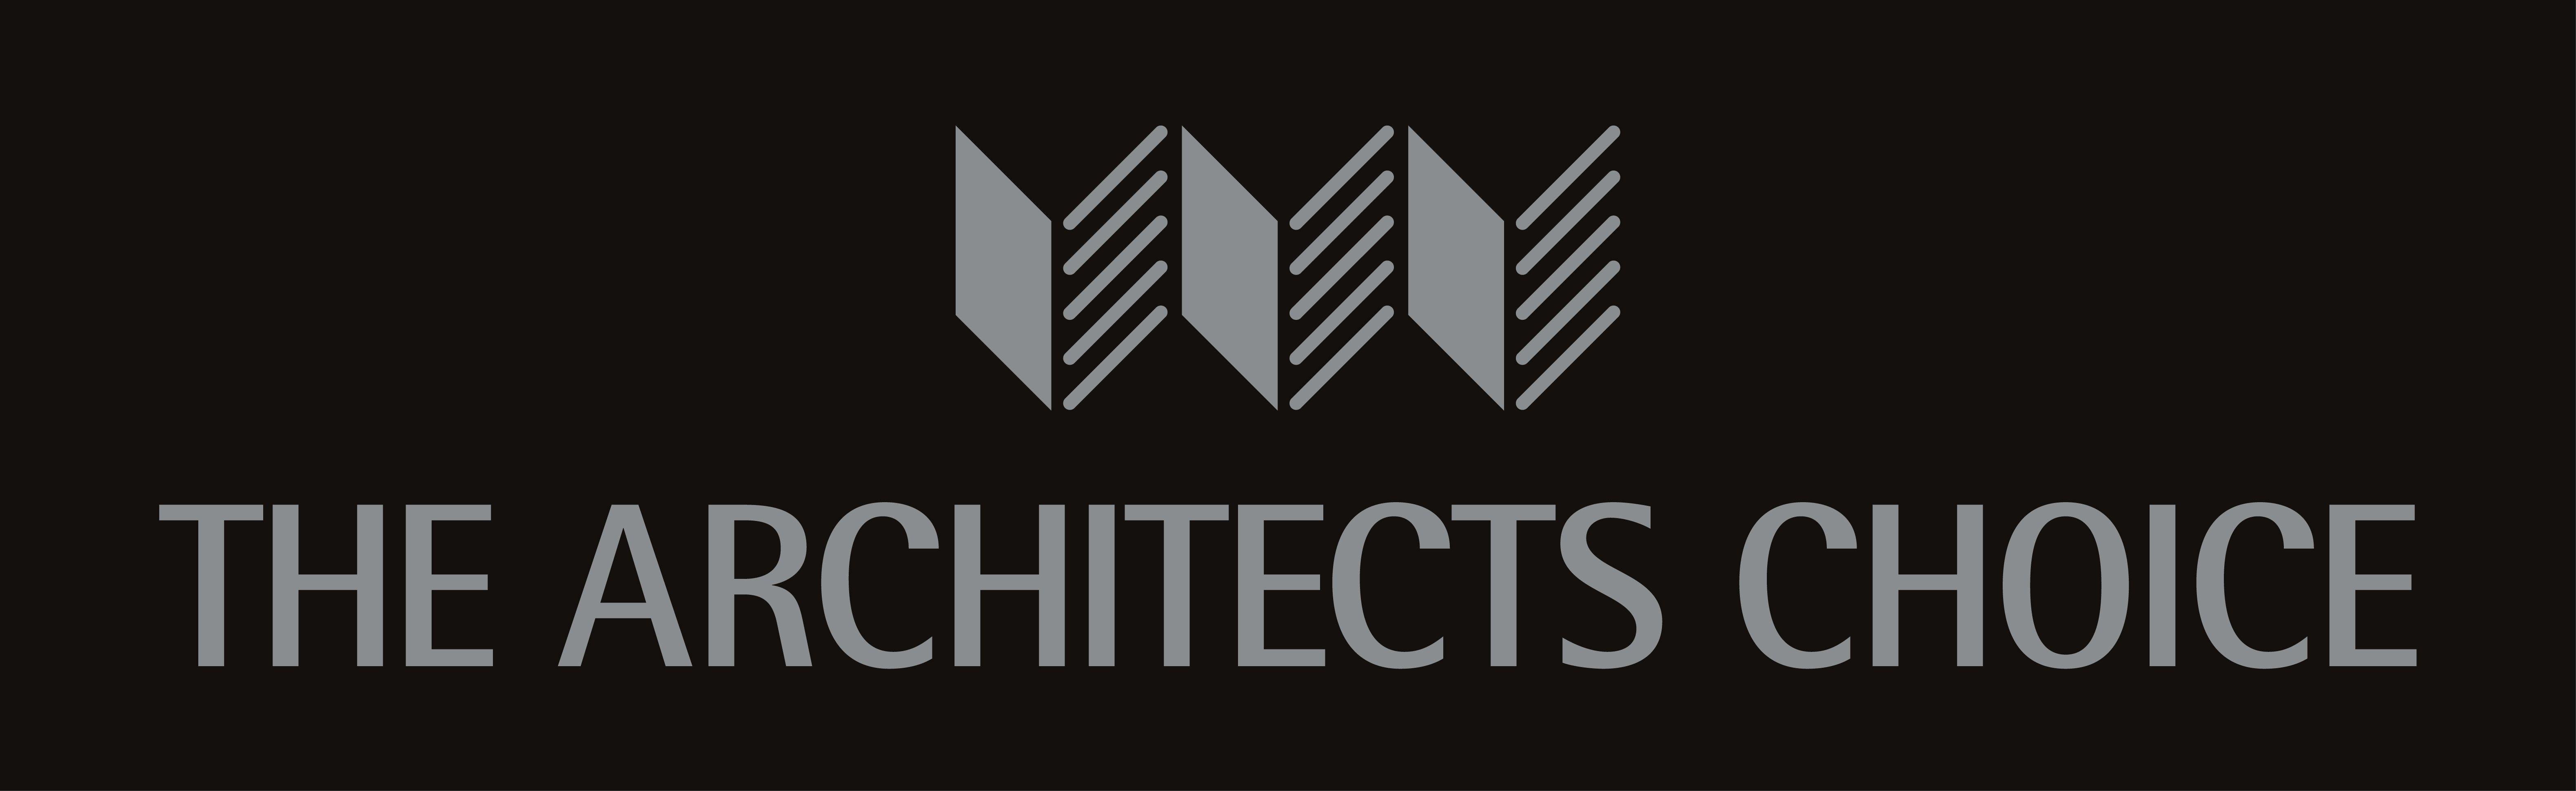 The Architects Choice logo